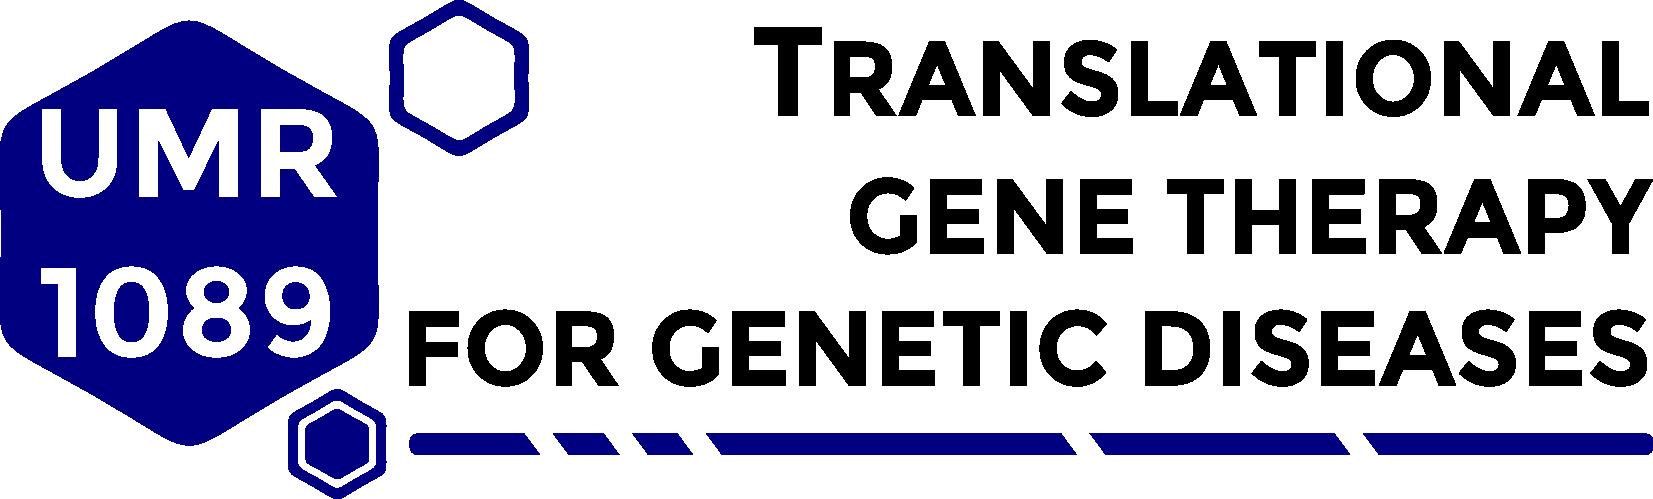 logo UMR1089